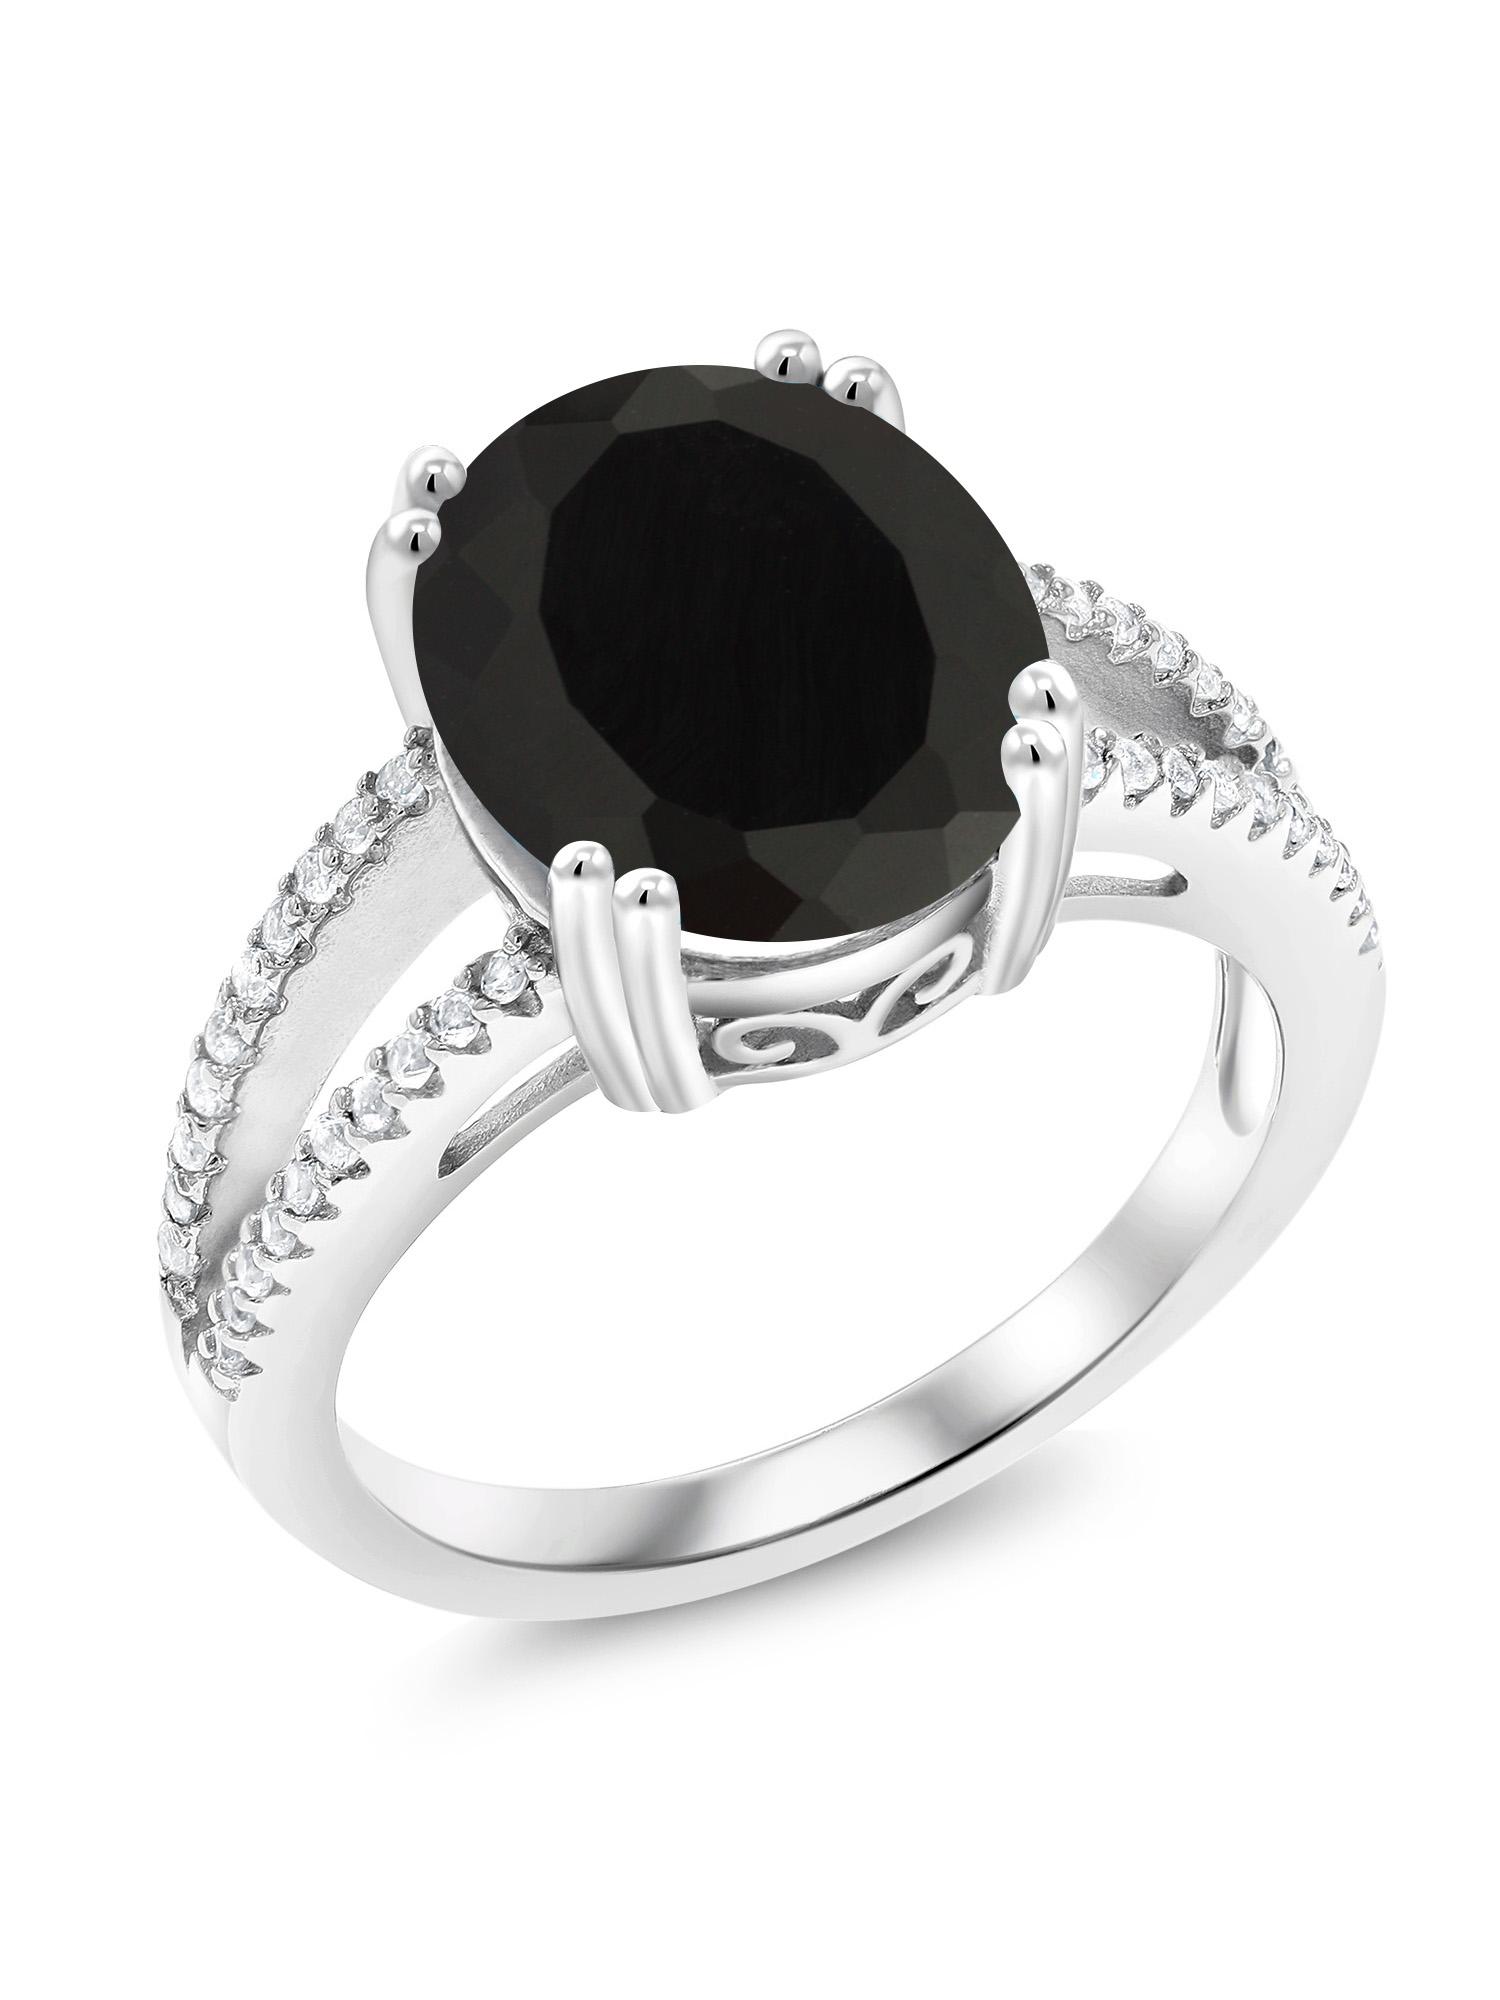 Wedding Ring Anniversary Ring Black Gemstone Ring 925 Sterling Silver Ring Engagement Ring Black Onyx Ring